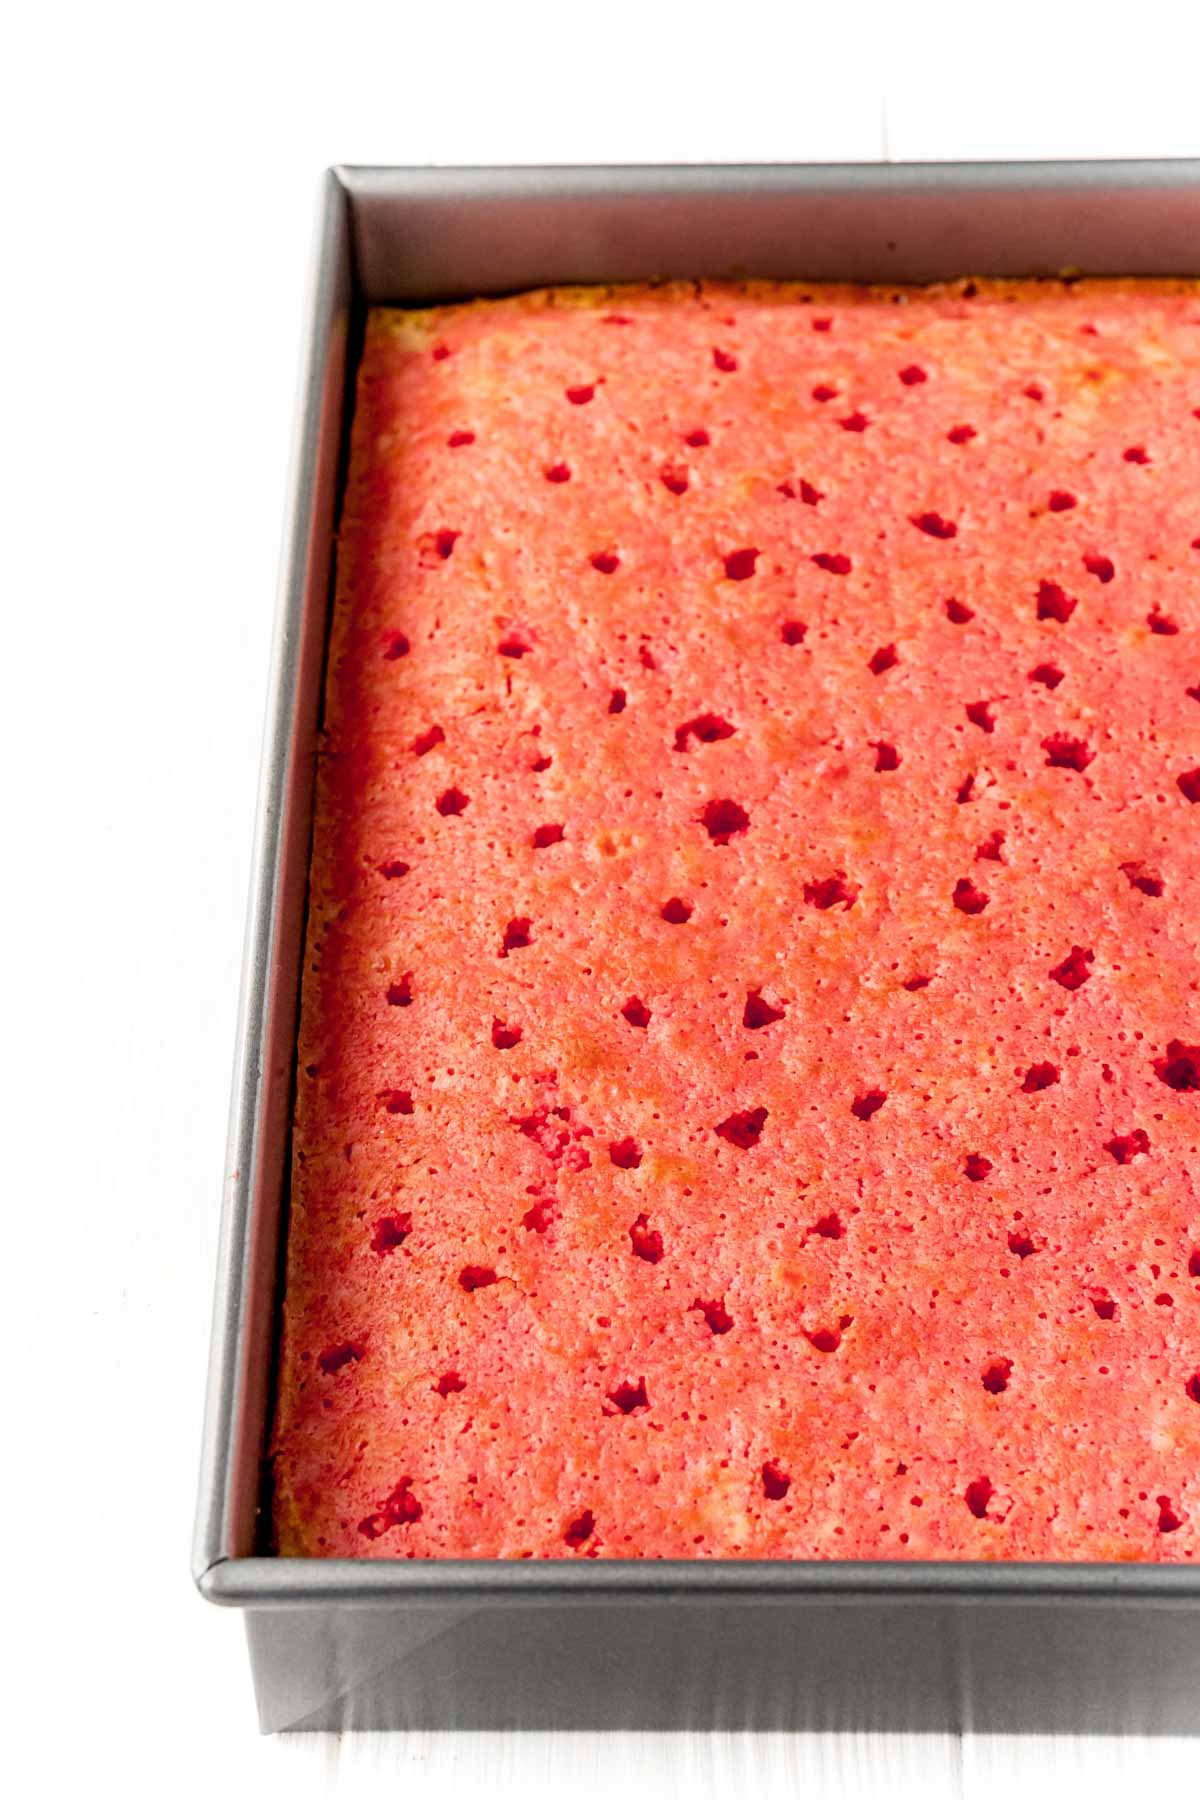 Raspberry jello poke cake chilling in a pan